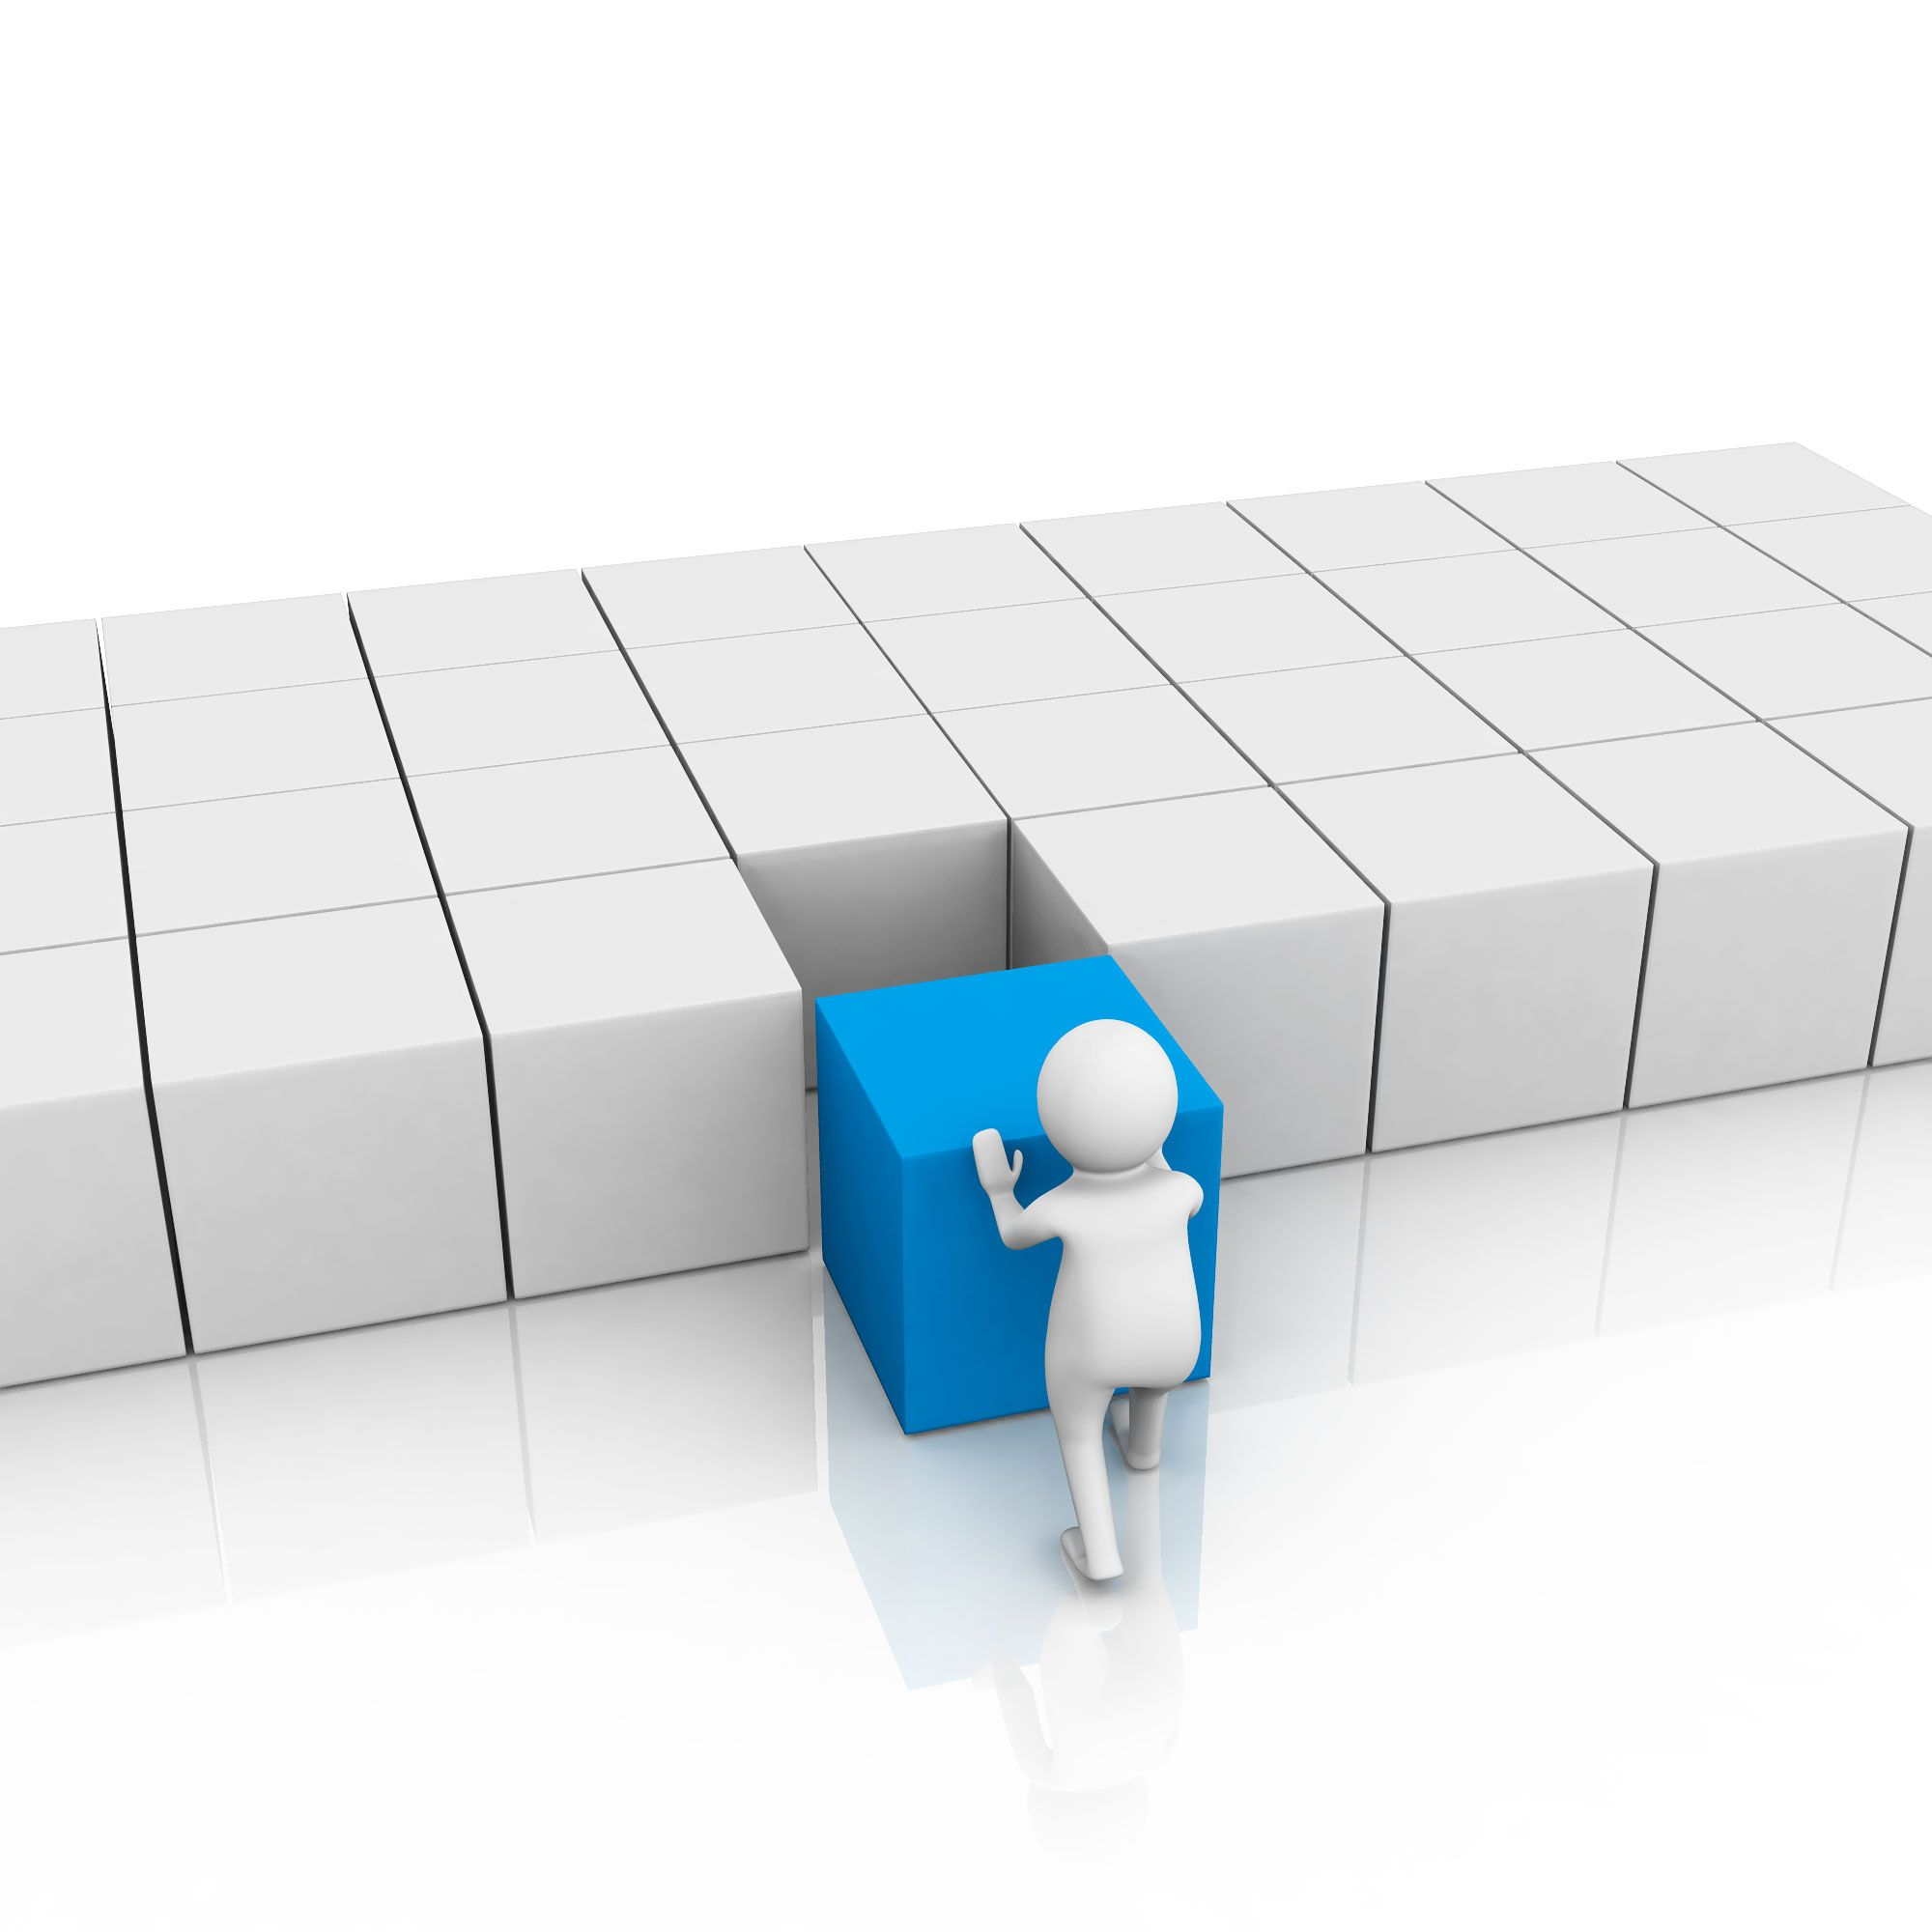 3d_man_pushing_blue_cube_inside_white_cubes_problem_solving_stock_photo_Slide01